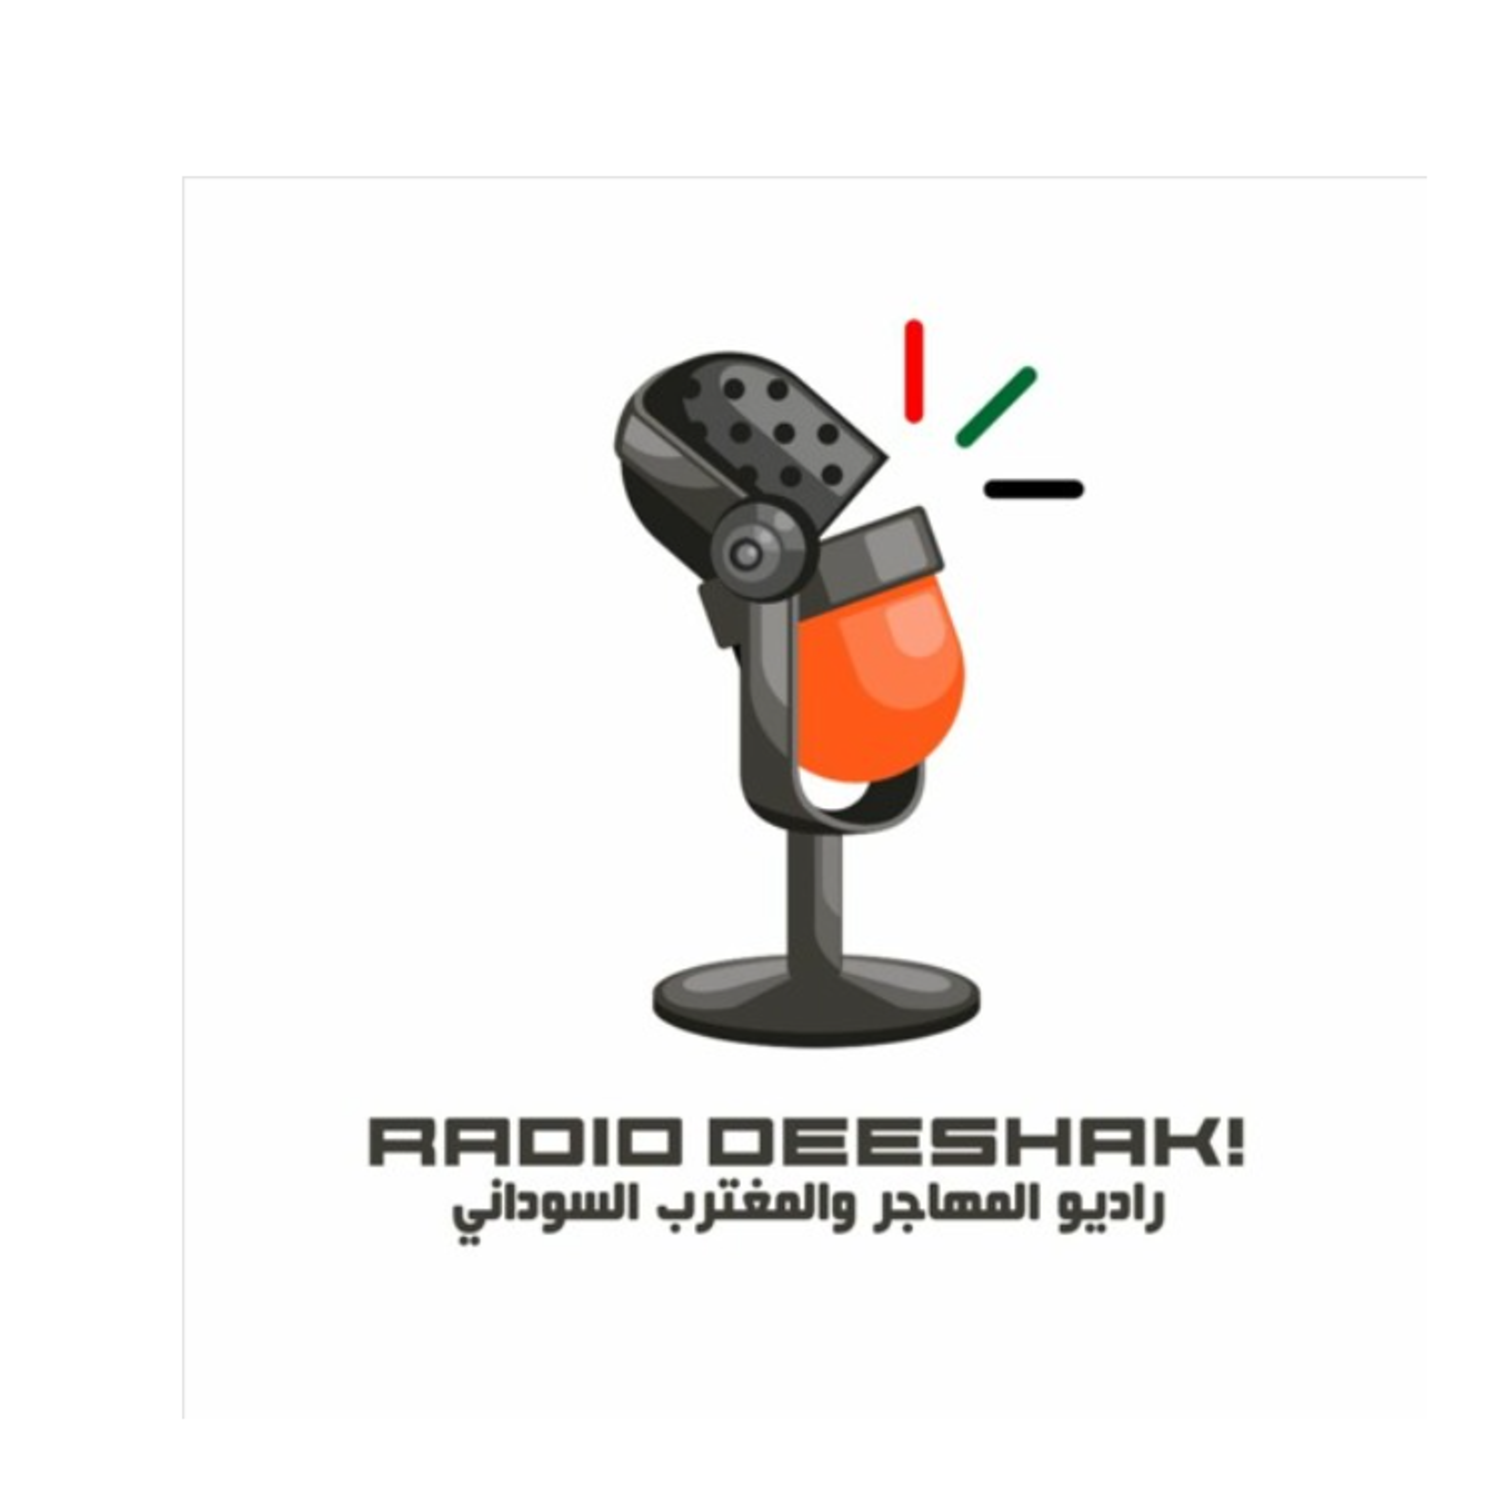 Radio DeeShaK- Sudan